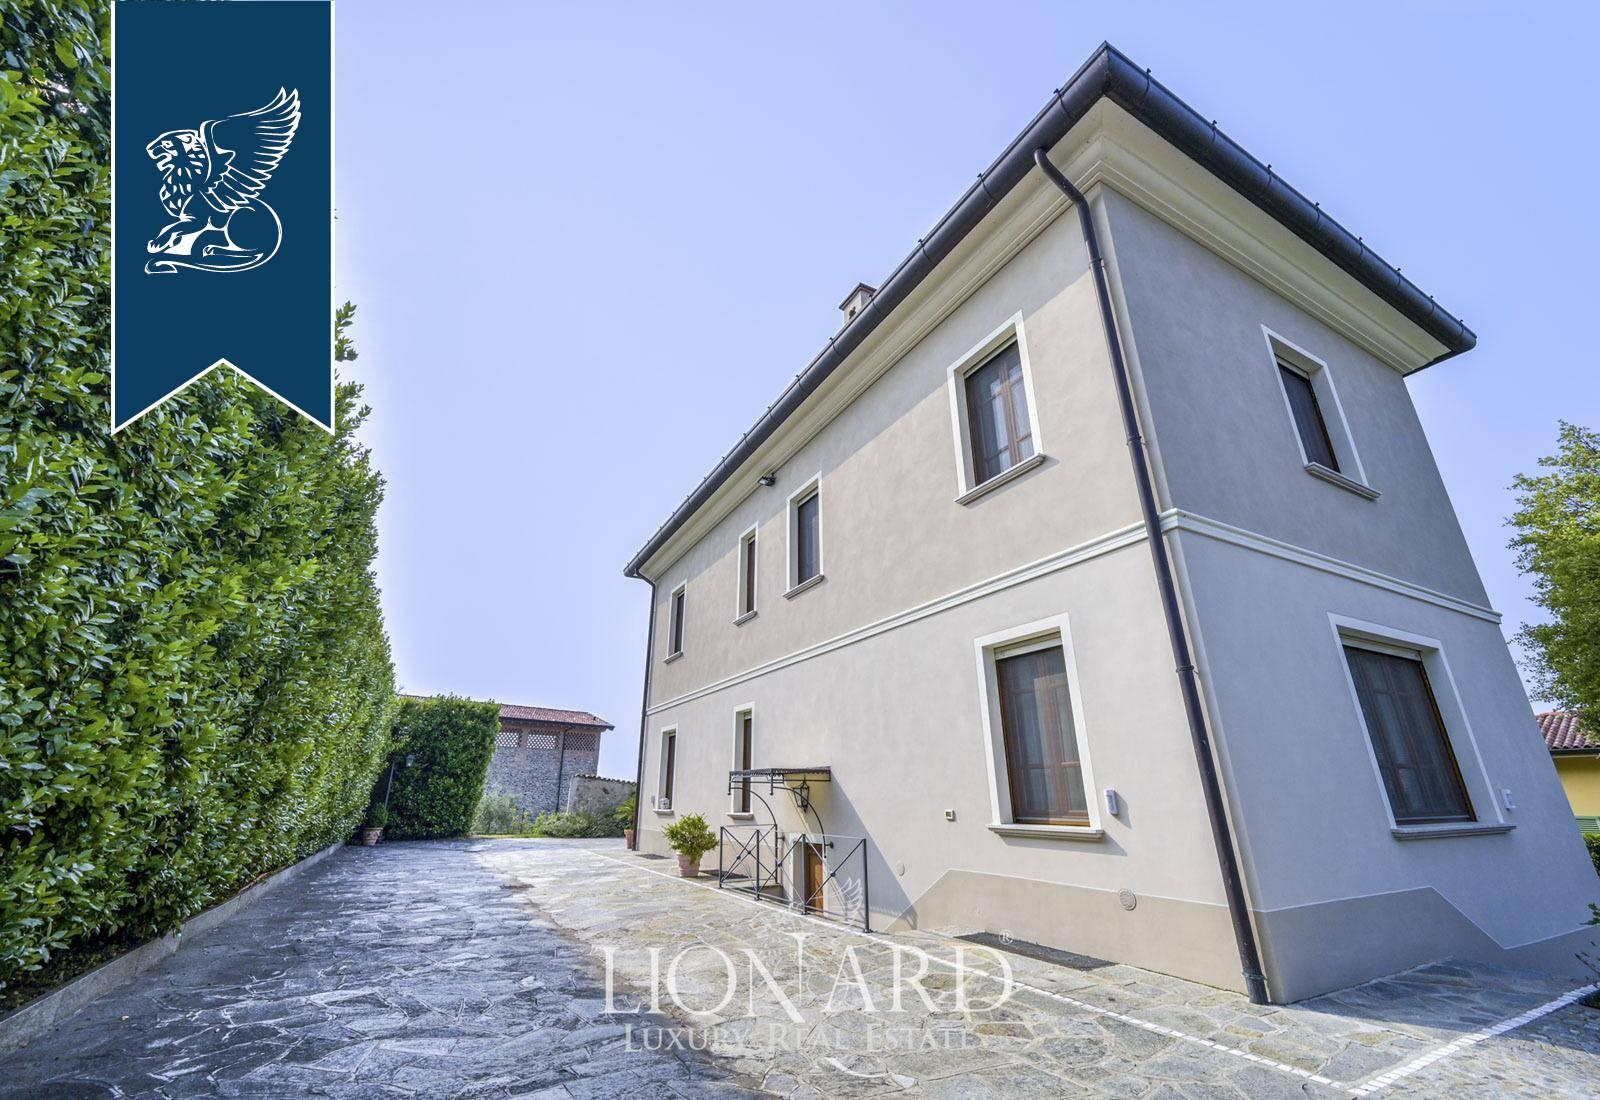 Villa in Vendita a Erbusco: 0 locali, 400 mq - Foto 3